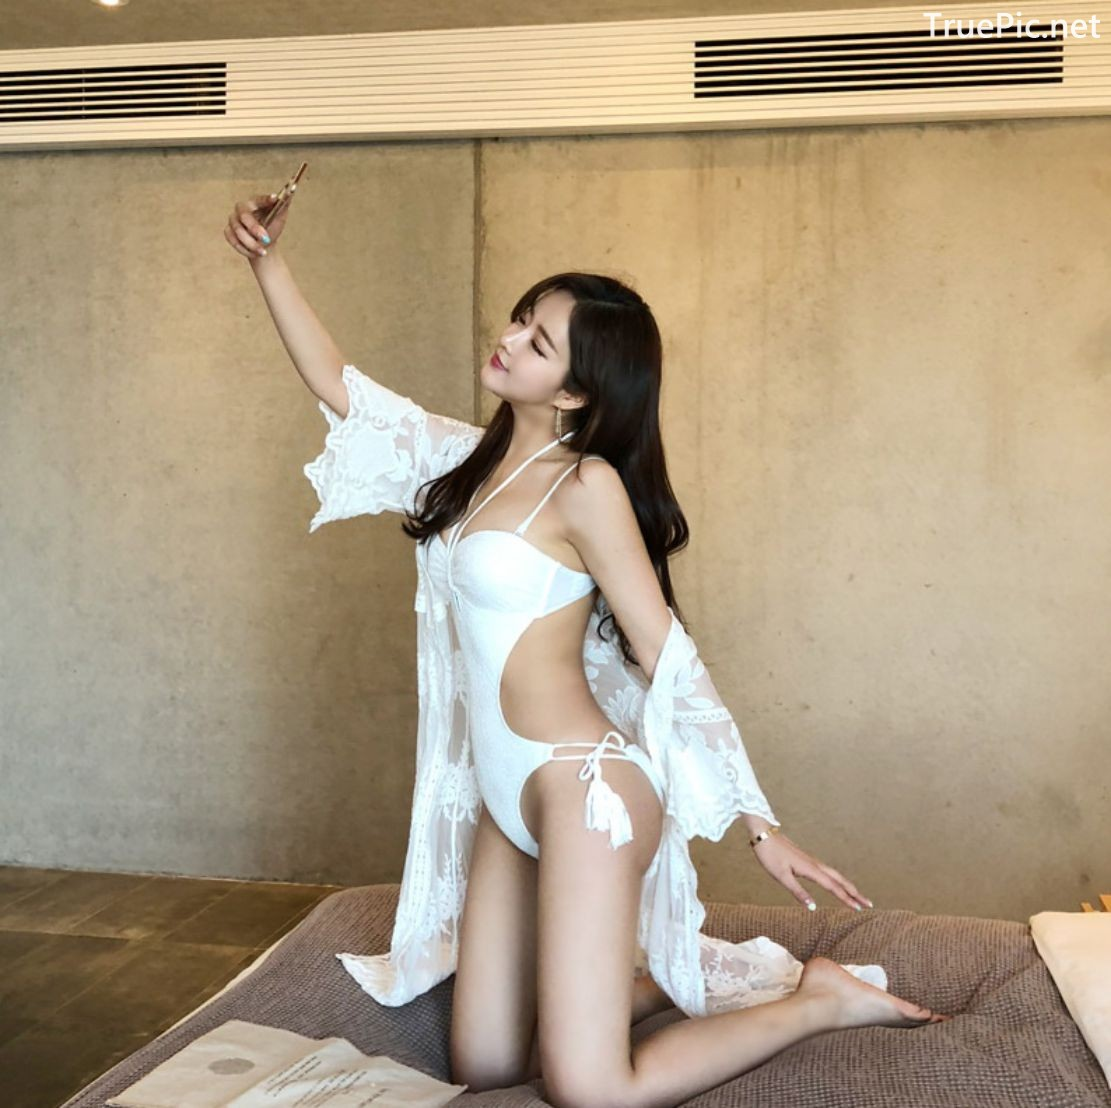 Image Korean Fashion Model - Kang Eun Wook - White Apple Swimsuit - TruePic.net - Picture-9